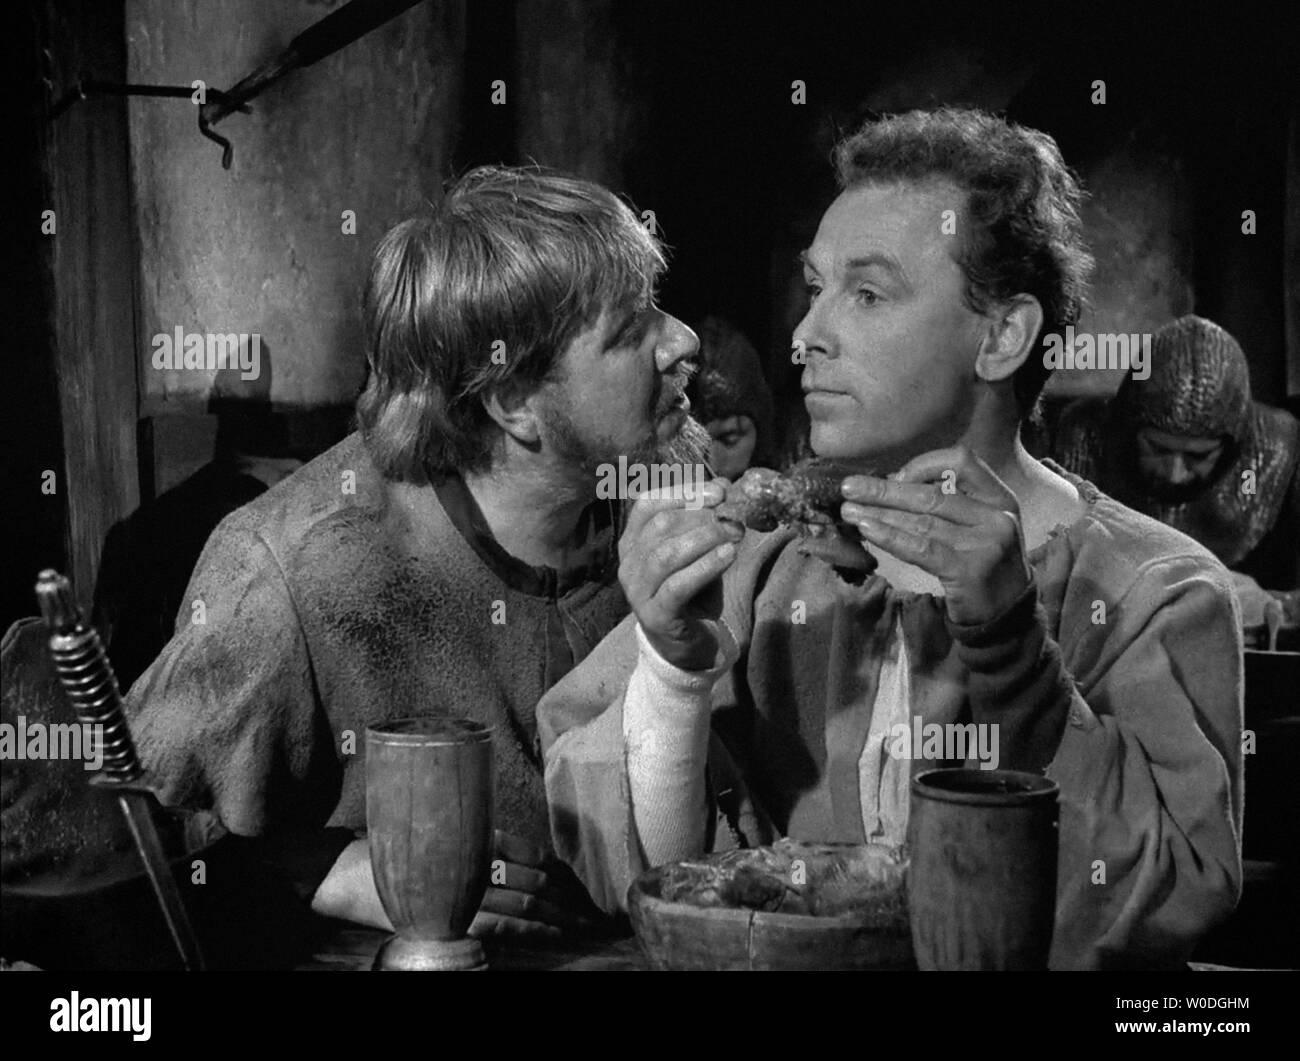 LE SEPTIEME SCEAU LE 7eme SCEAU DET SJUNDE INSEGLET 1957 de Ingmar Bergman Ake Fridell Nils Poppe. d'apres la piece de Ingmar Bergman based on the pla Stock Photo